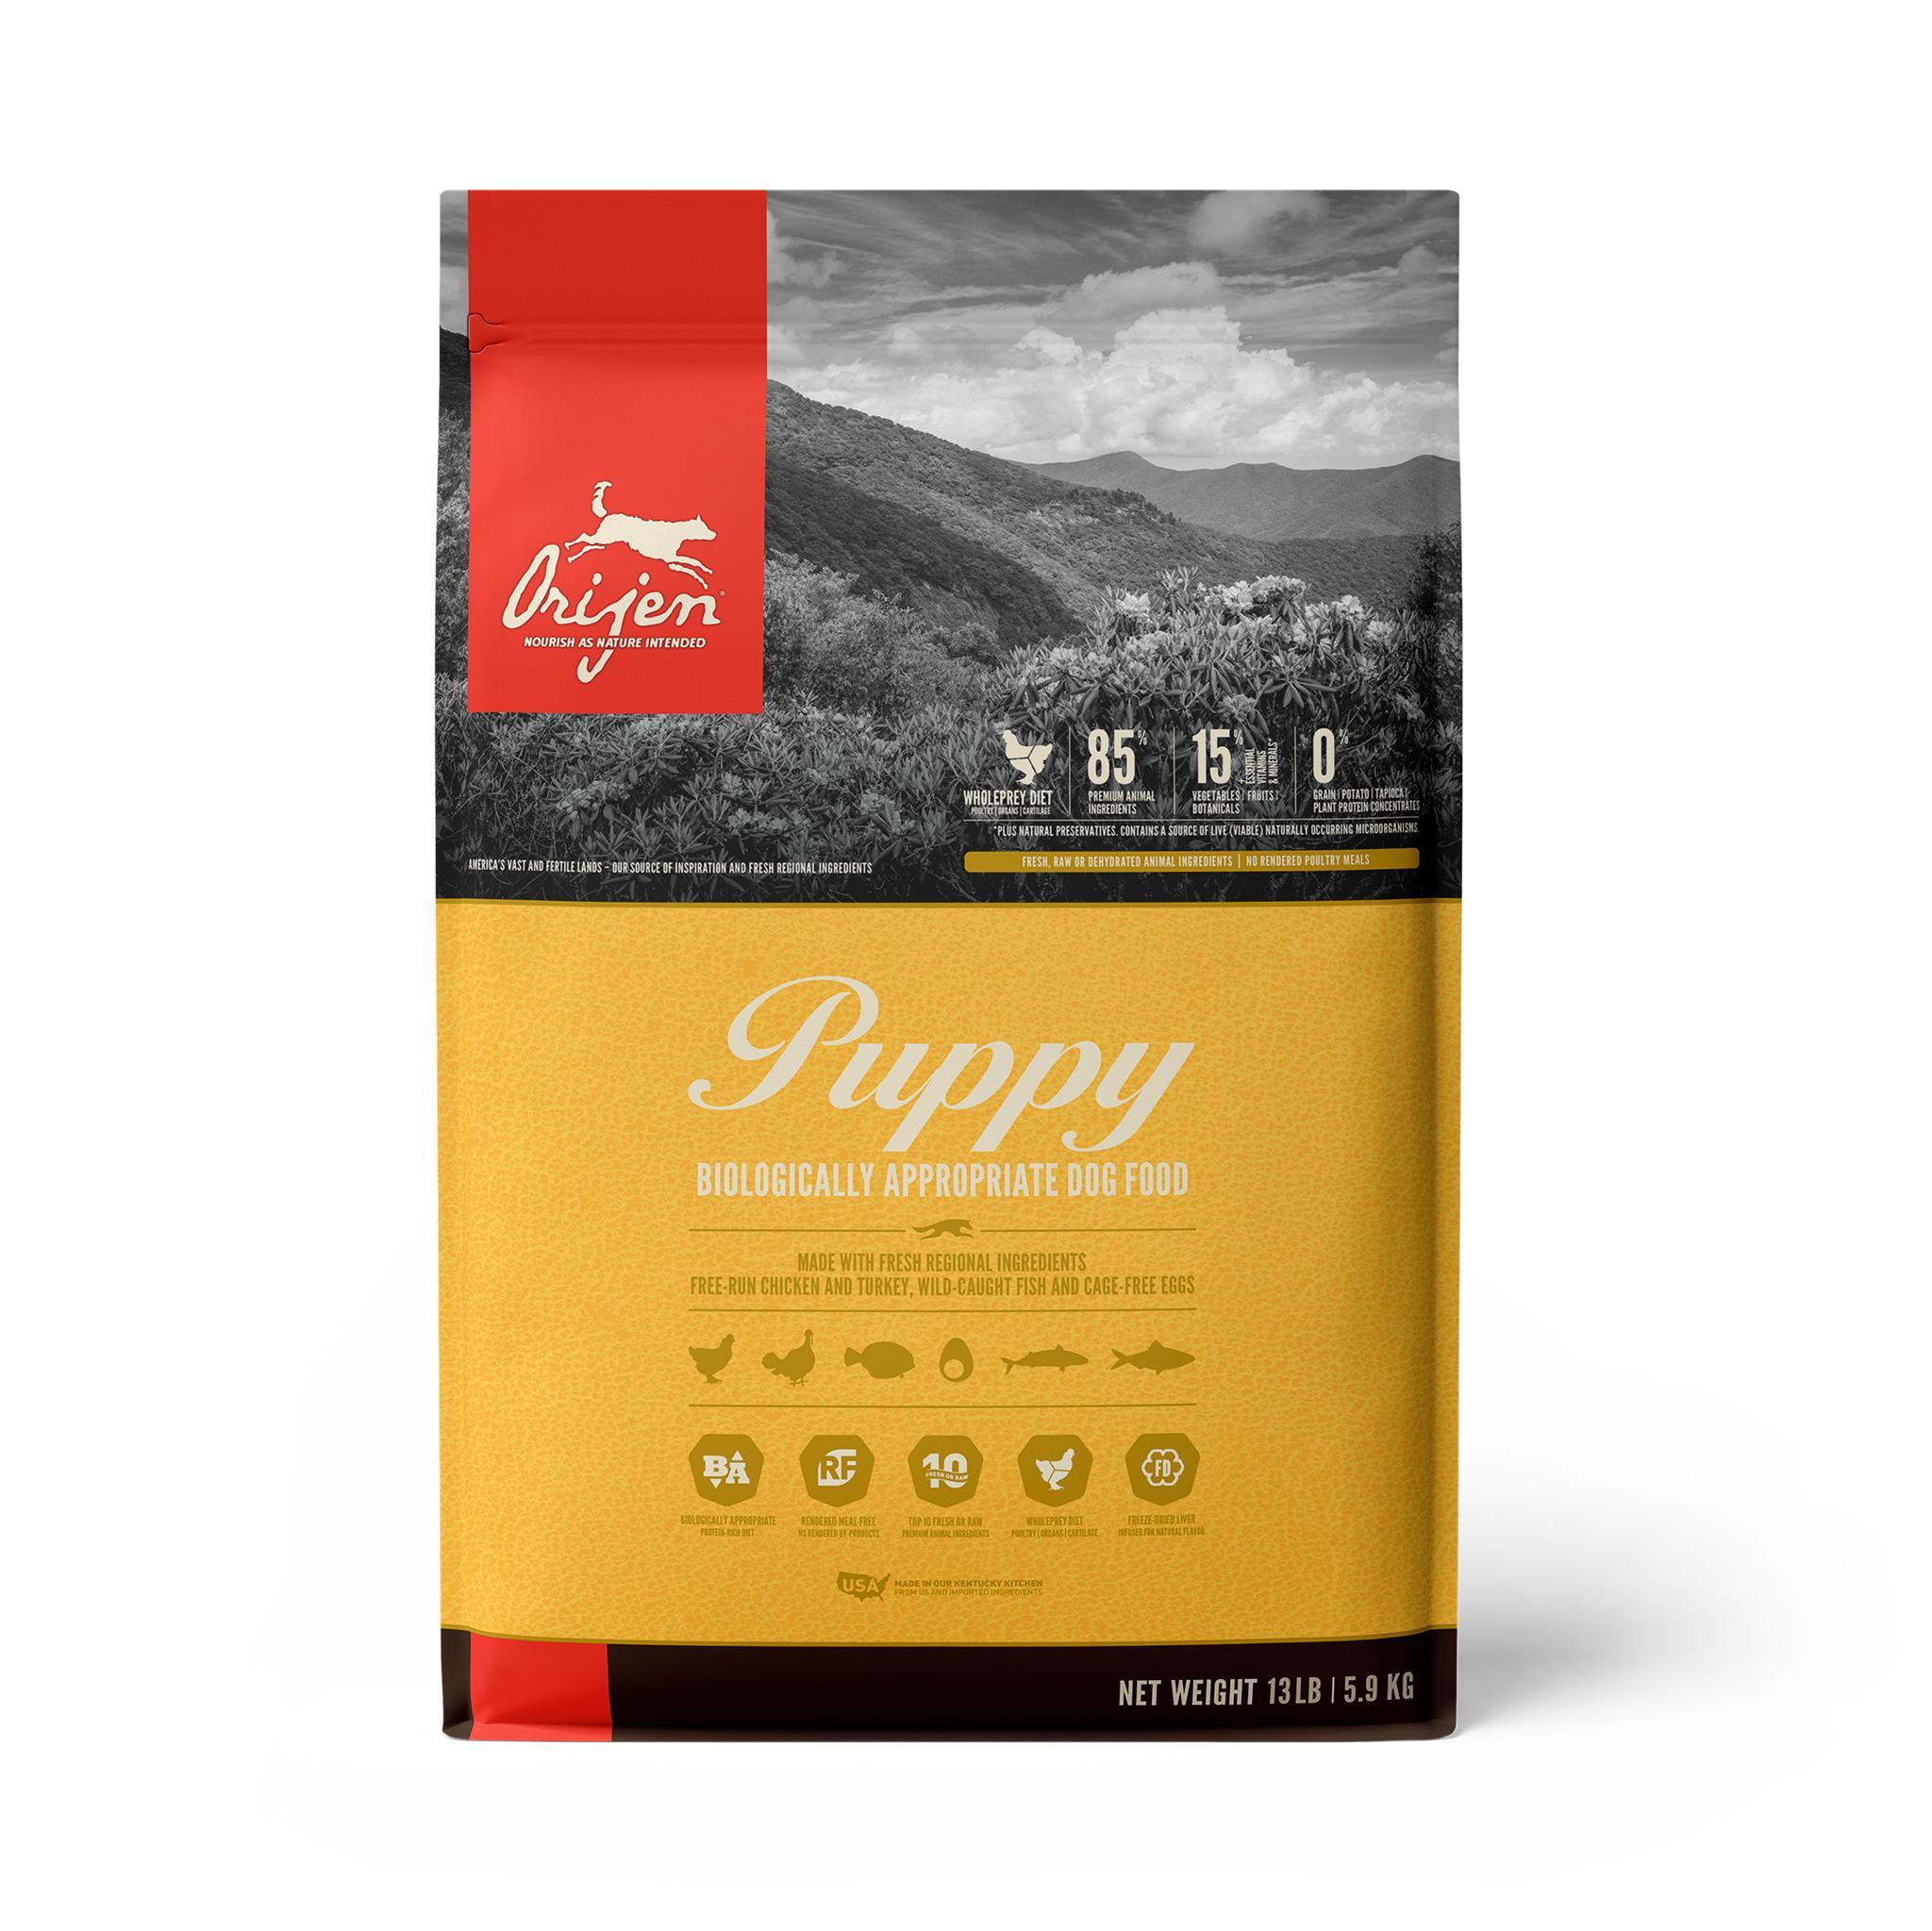 ORIJEN Puppy Grain-Free Dry Dog Food, 13-lb